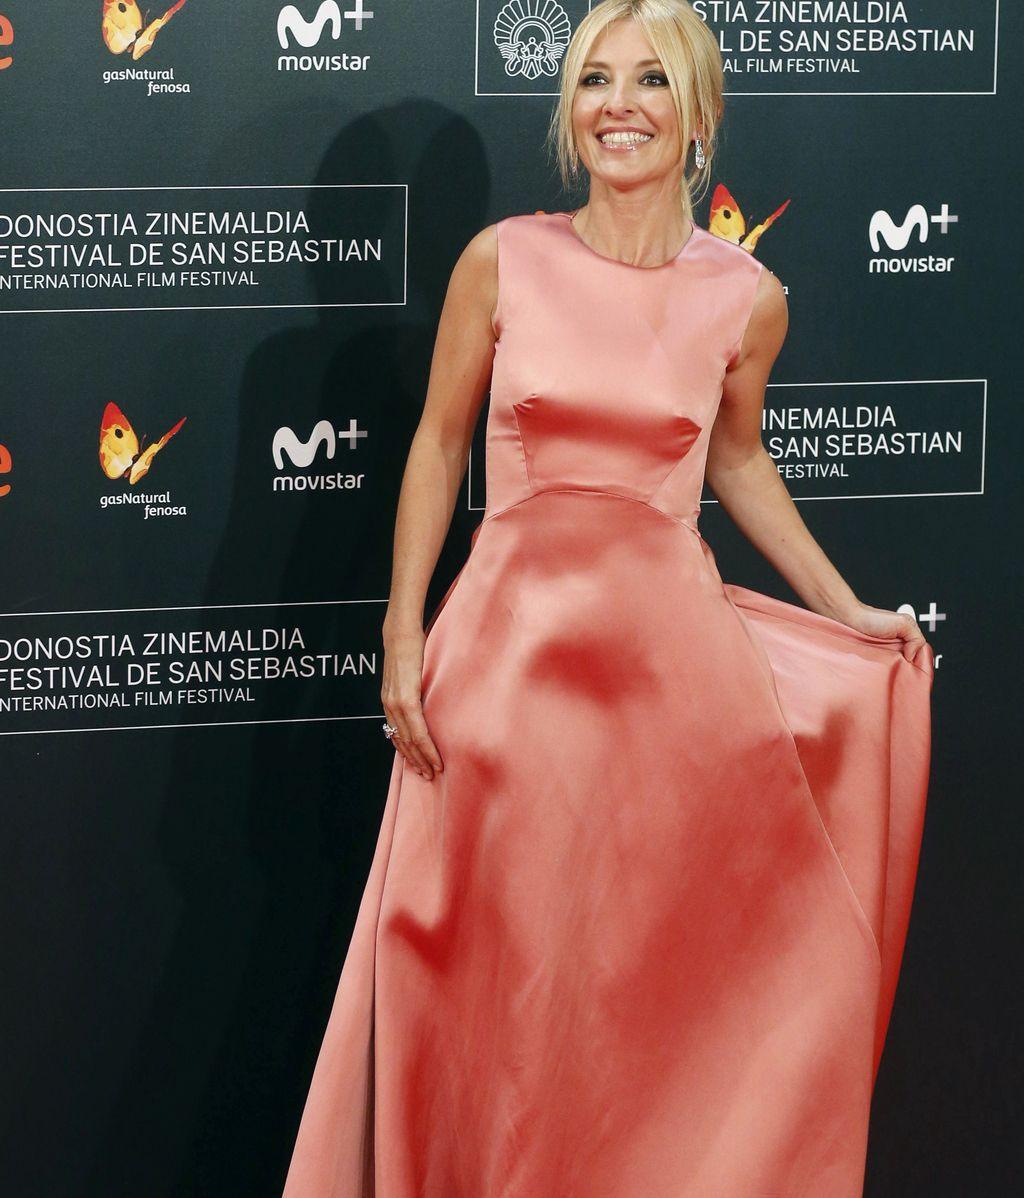 64º festival de cine en Donostia